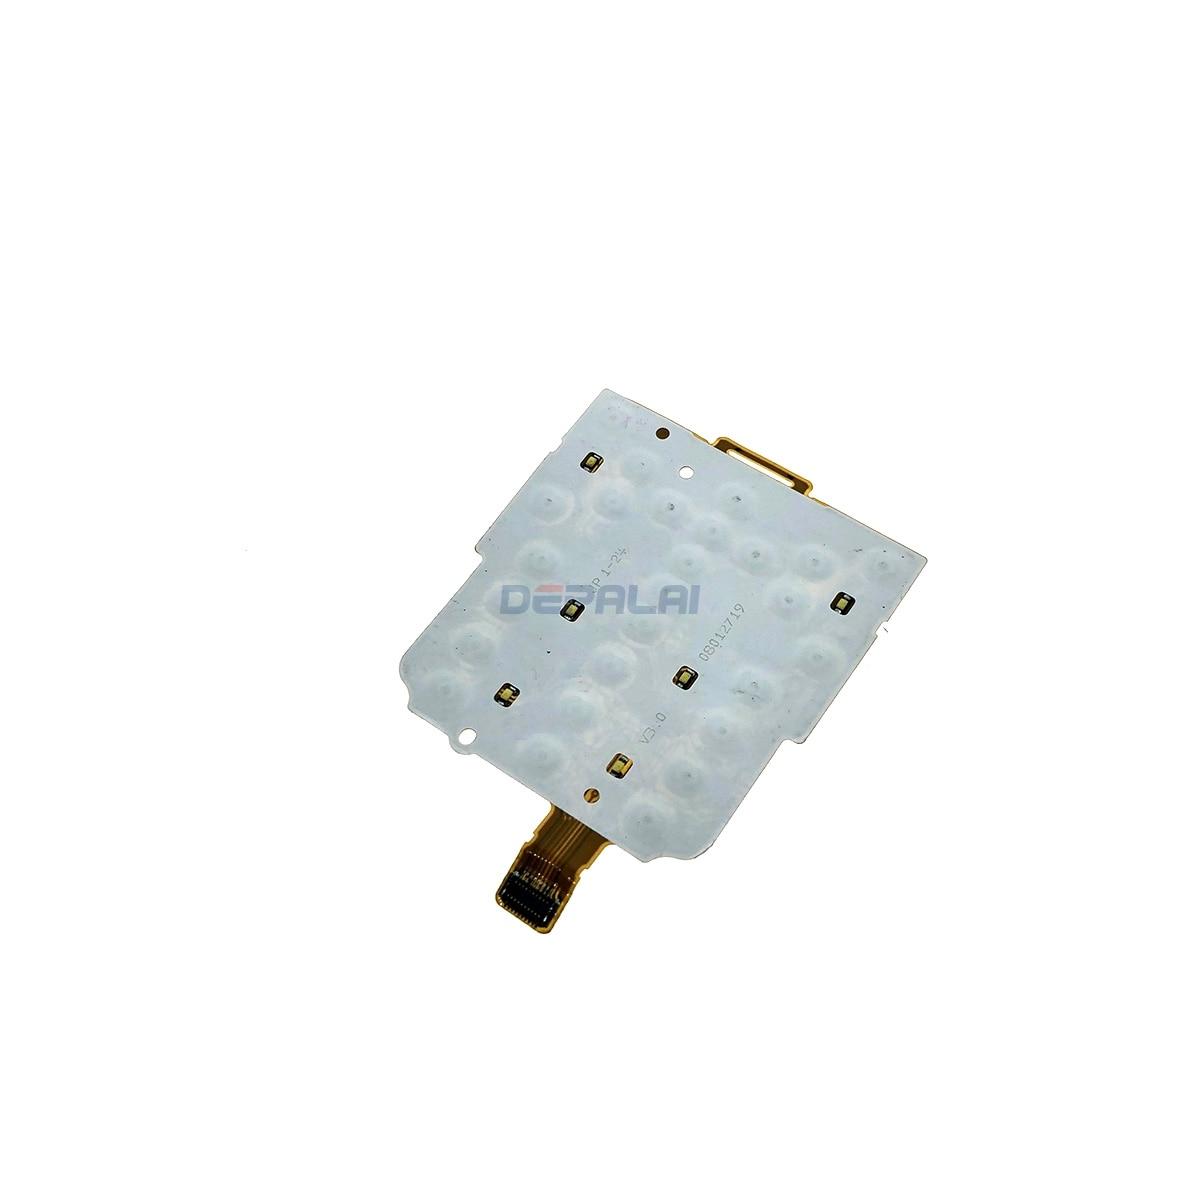 Mobile Phone Flex Cables Replacement Keypad Keyboard Joystick Membrane Flex Cable For Nokia E51